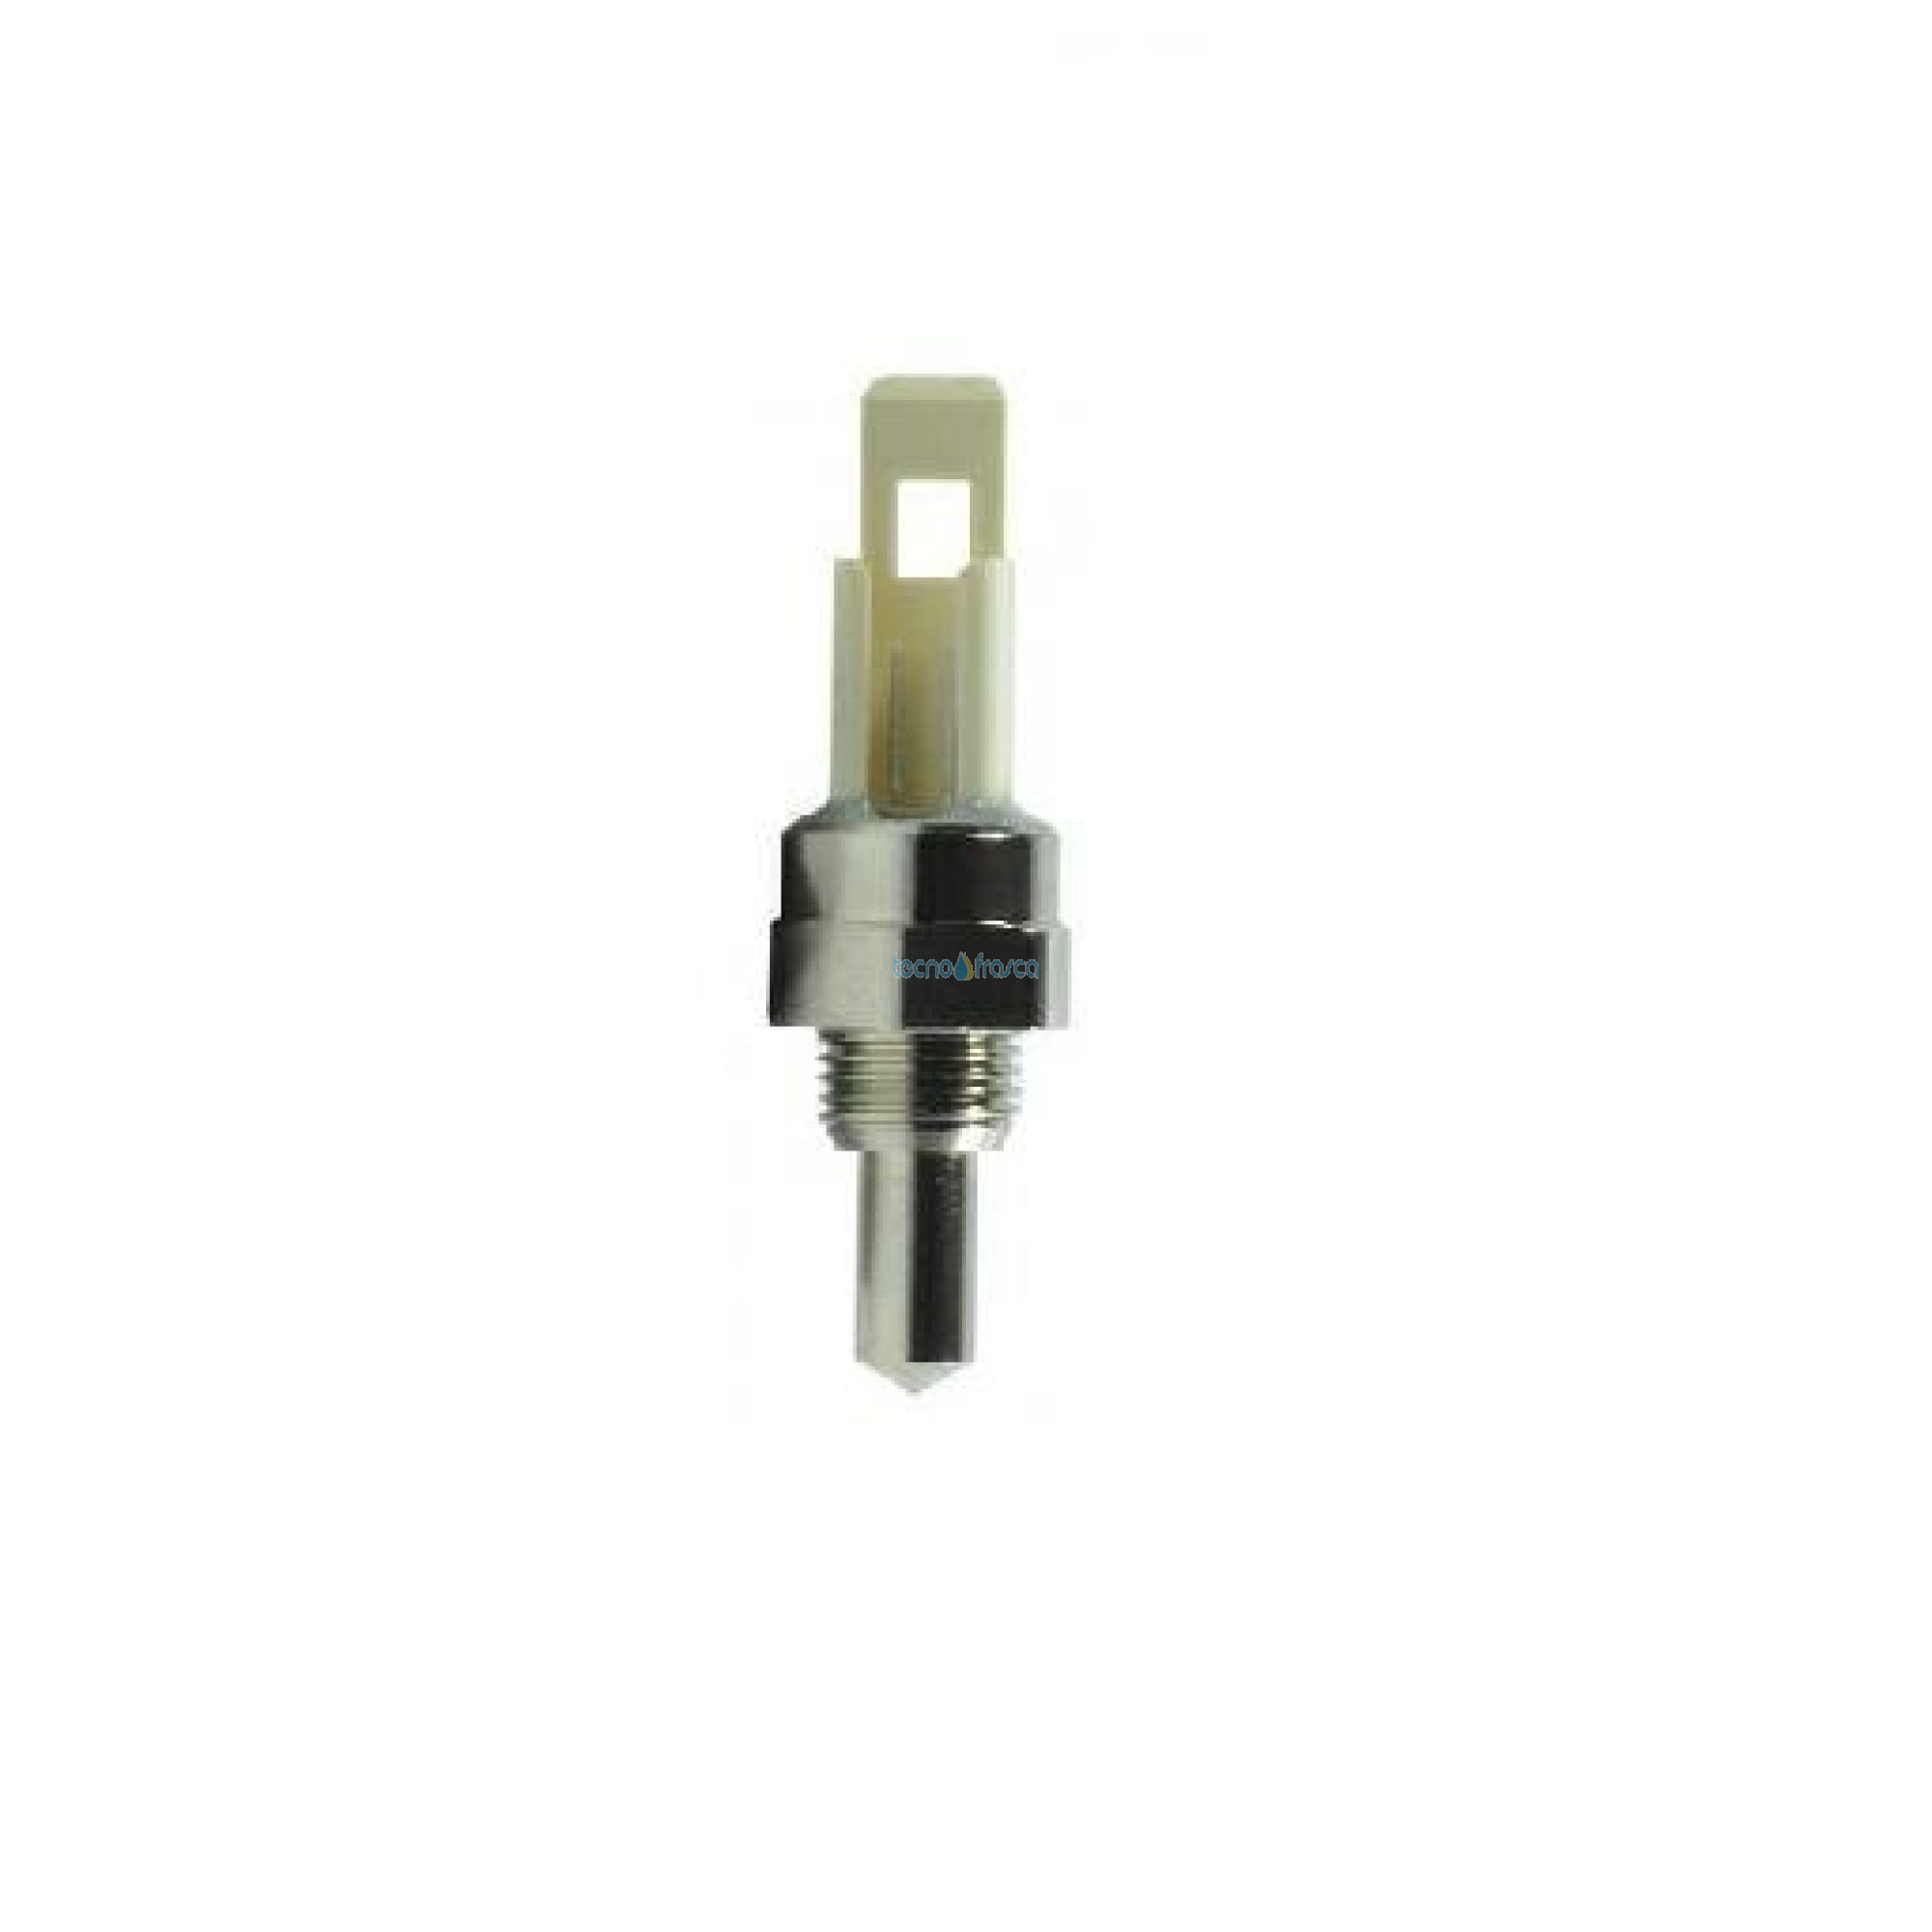 Immergas Sonda NTC immersione 3.016099 ex 1.021762